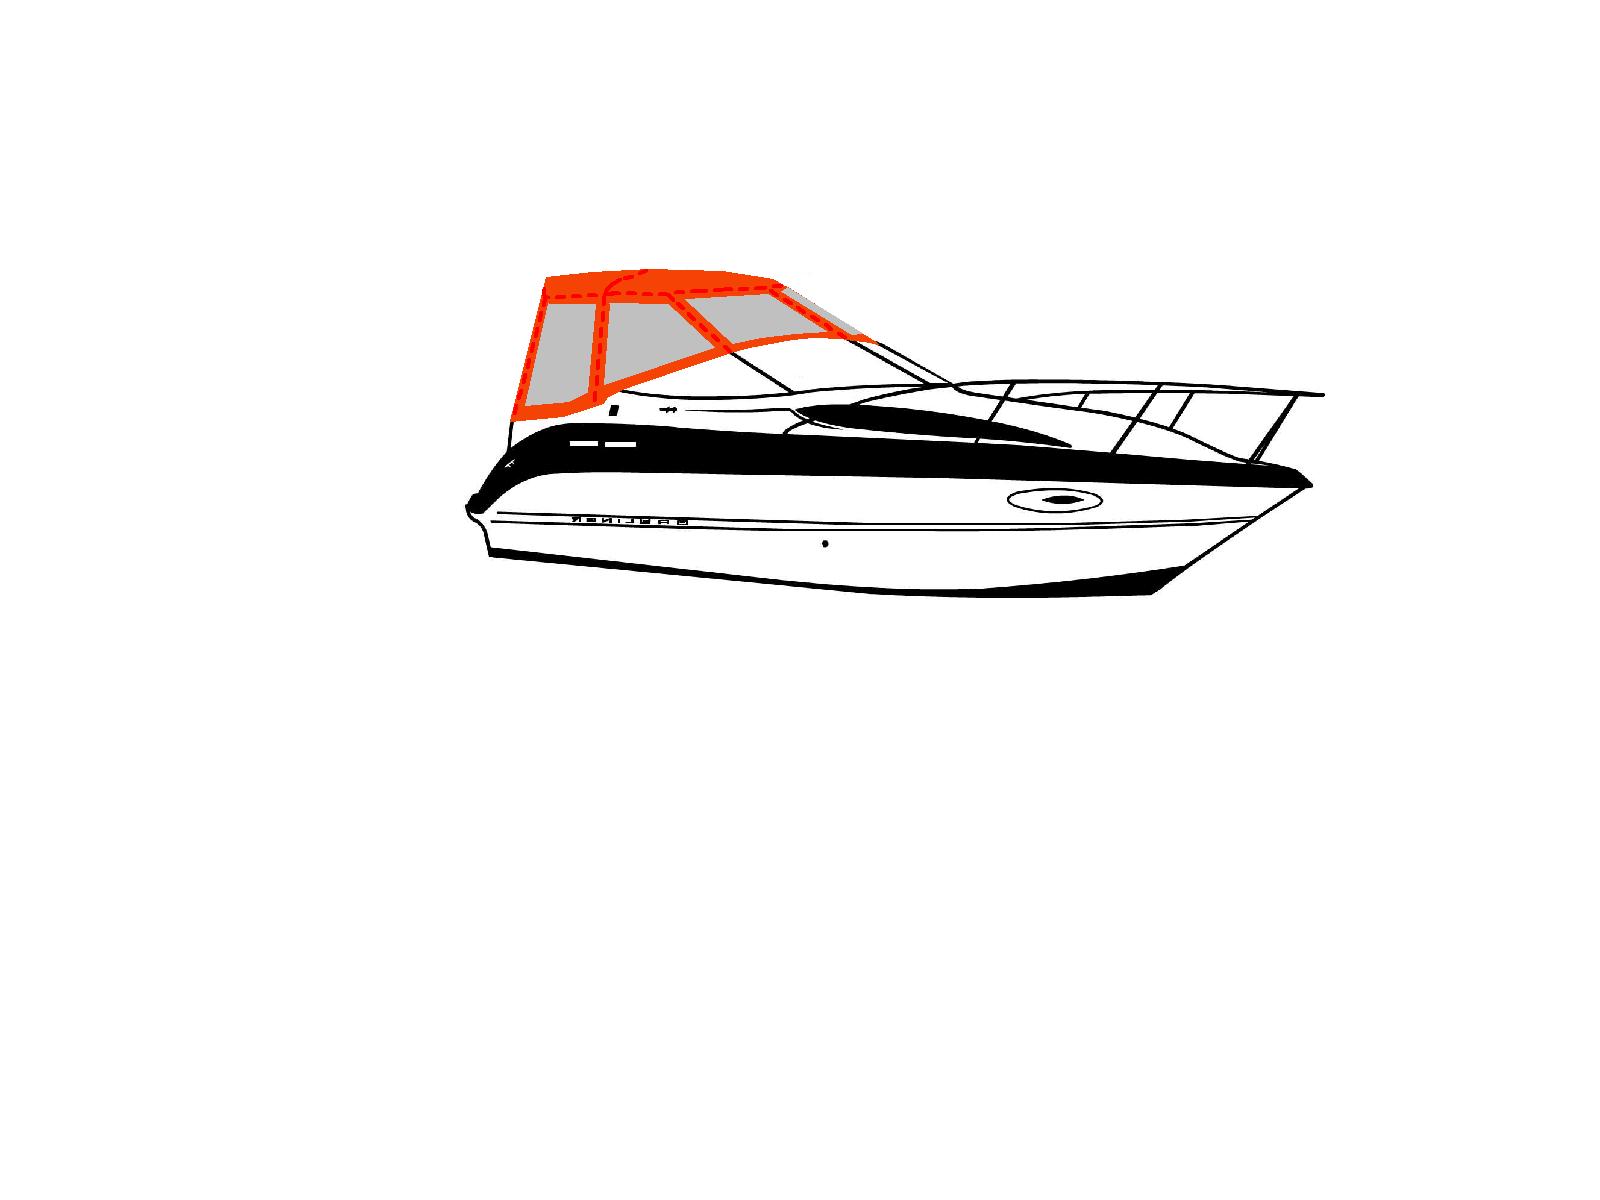 03 05 Typ S Motorboot Camperverdeck.PNG